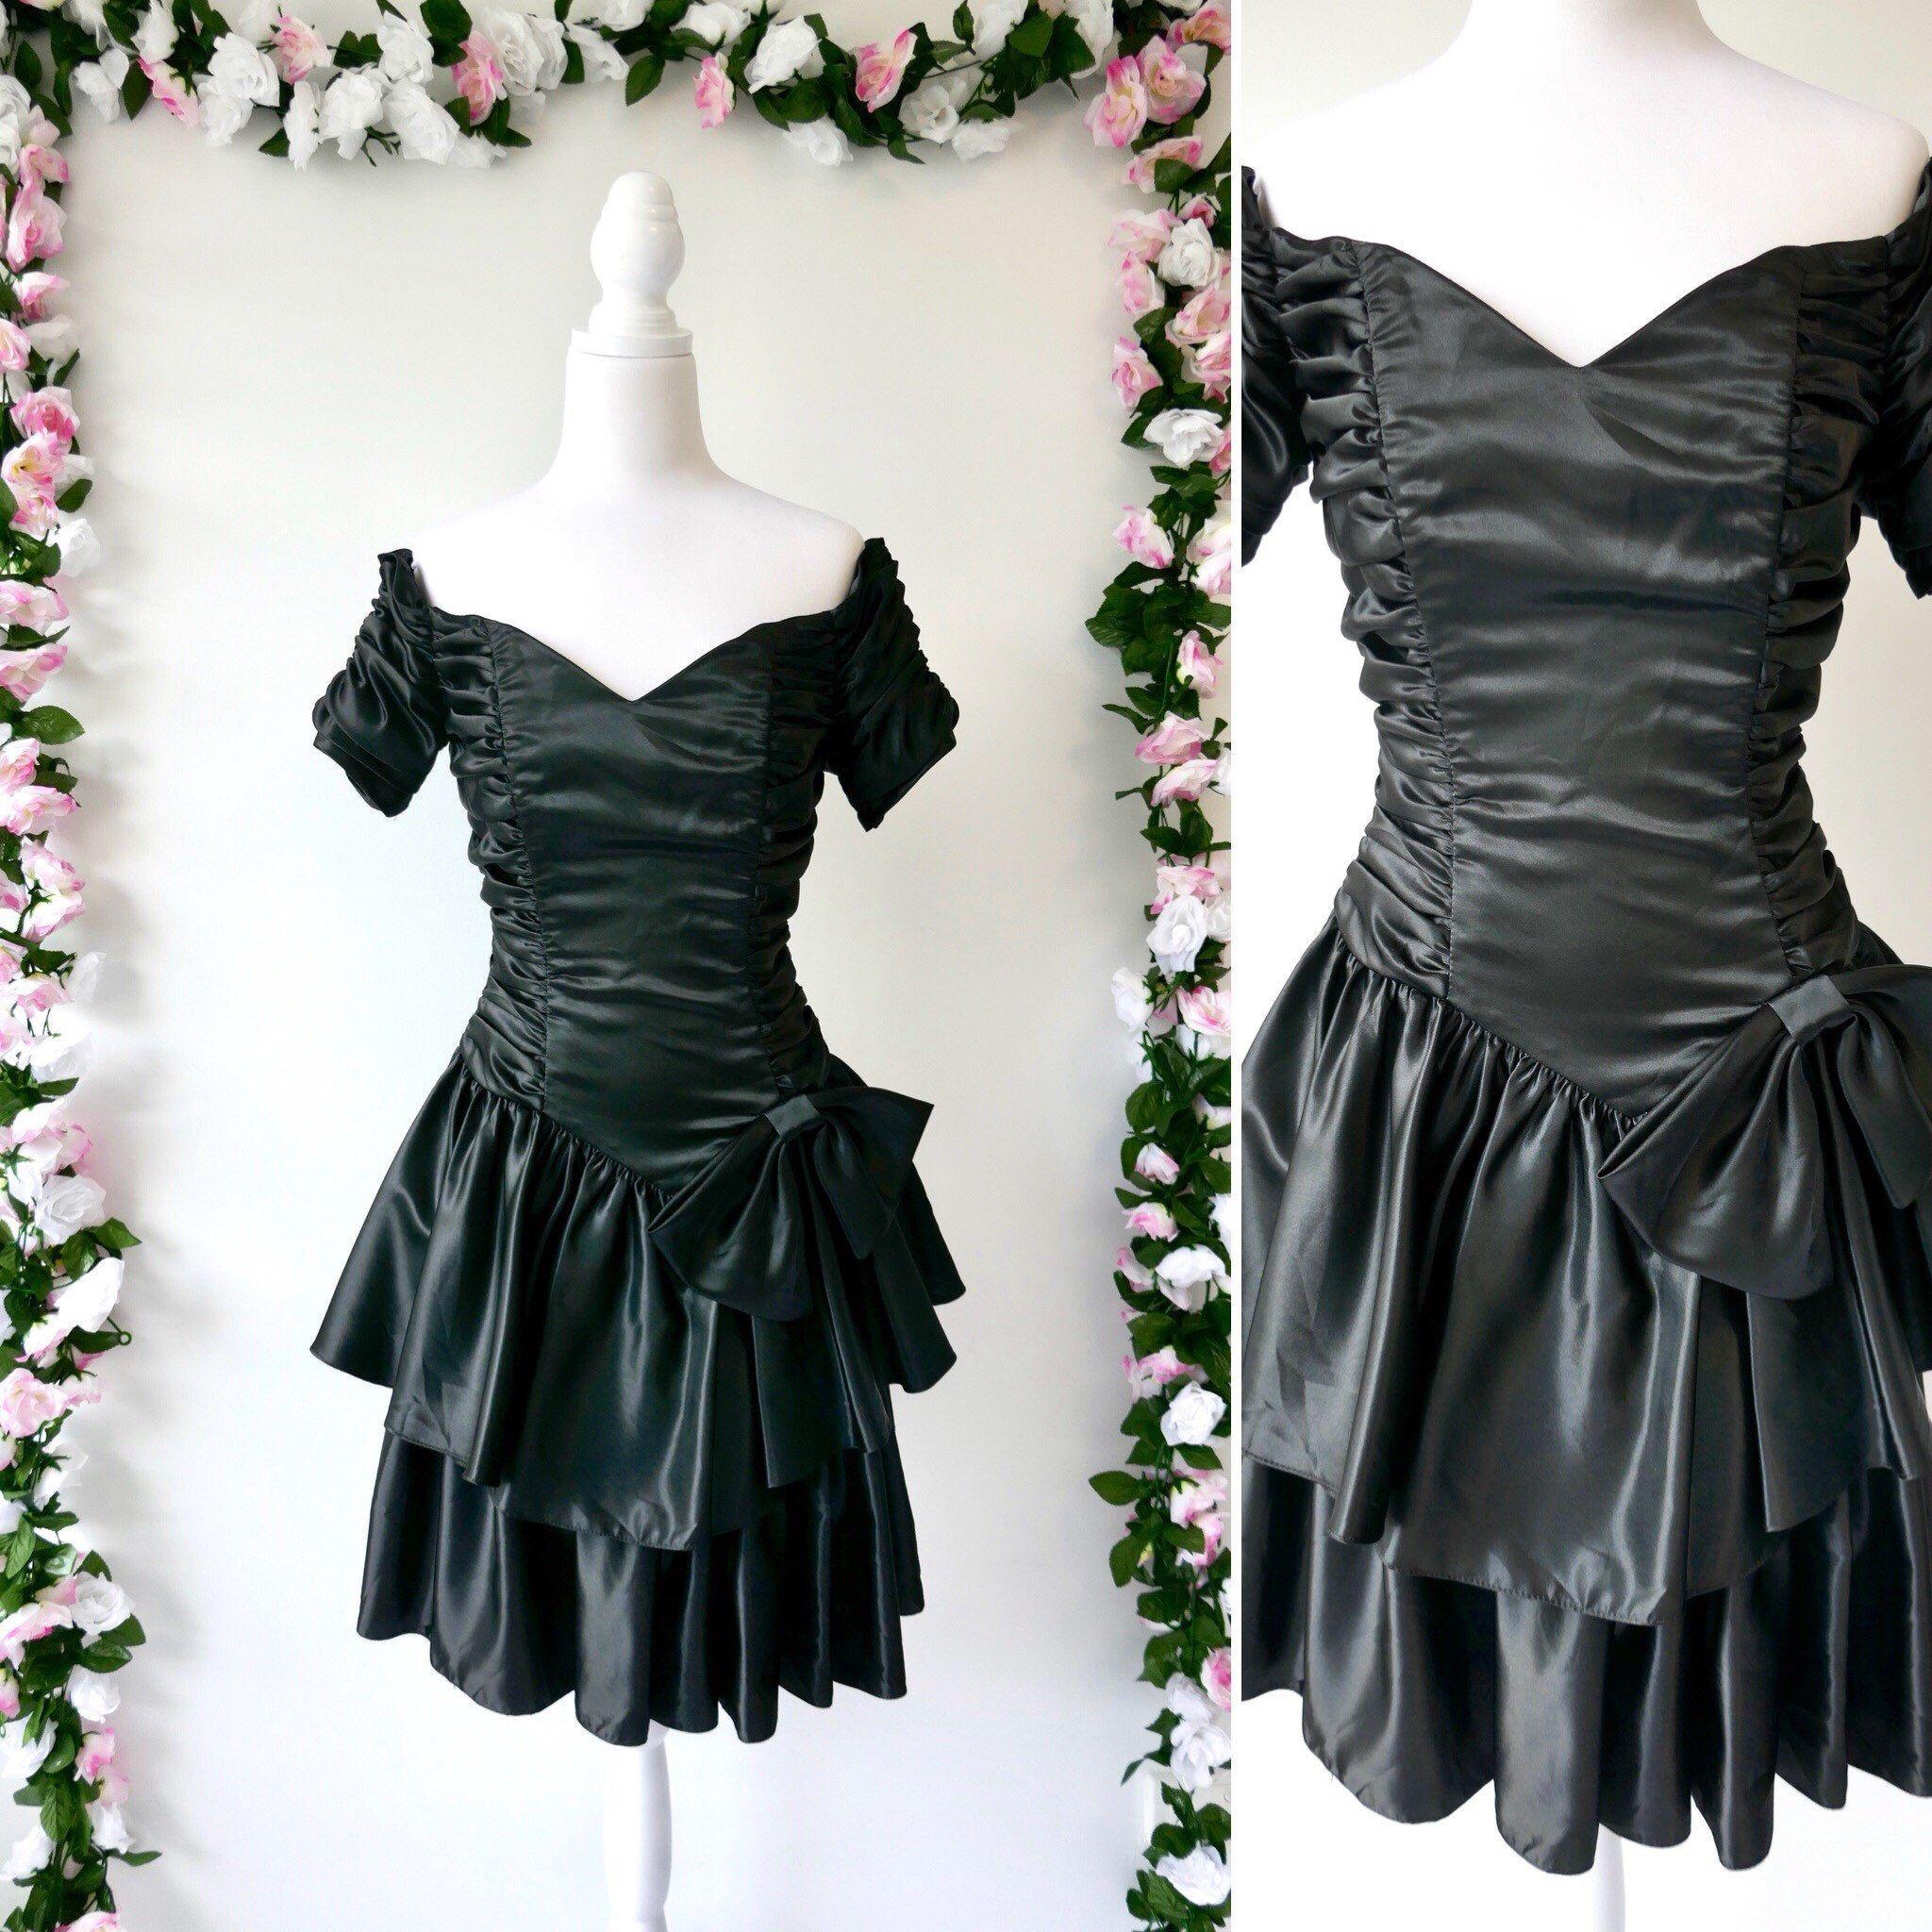 black 80s bow party dress Vintage 80s dress